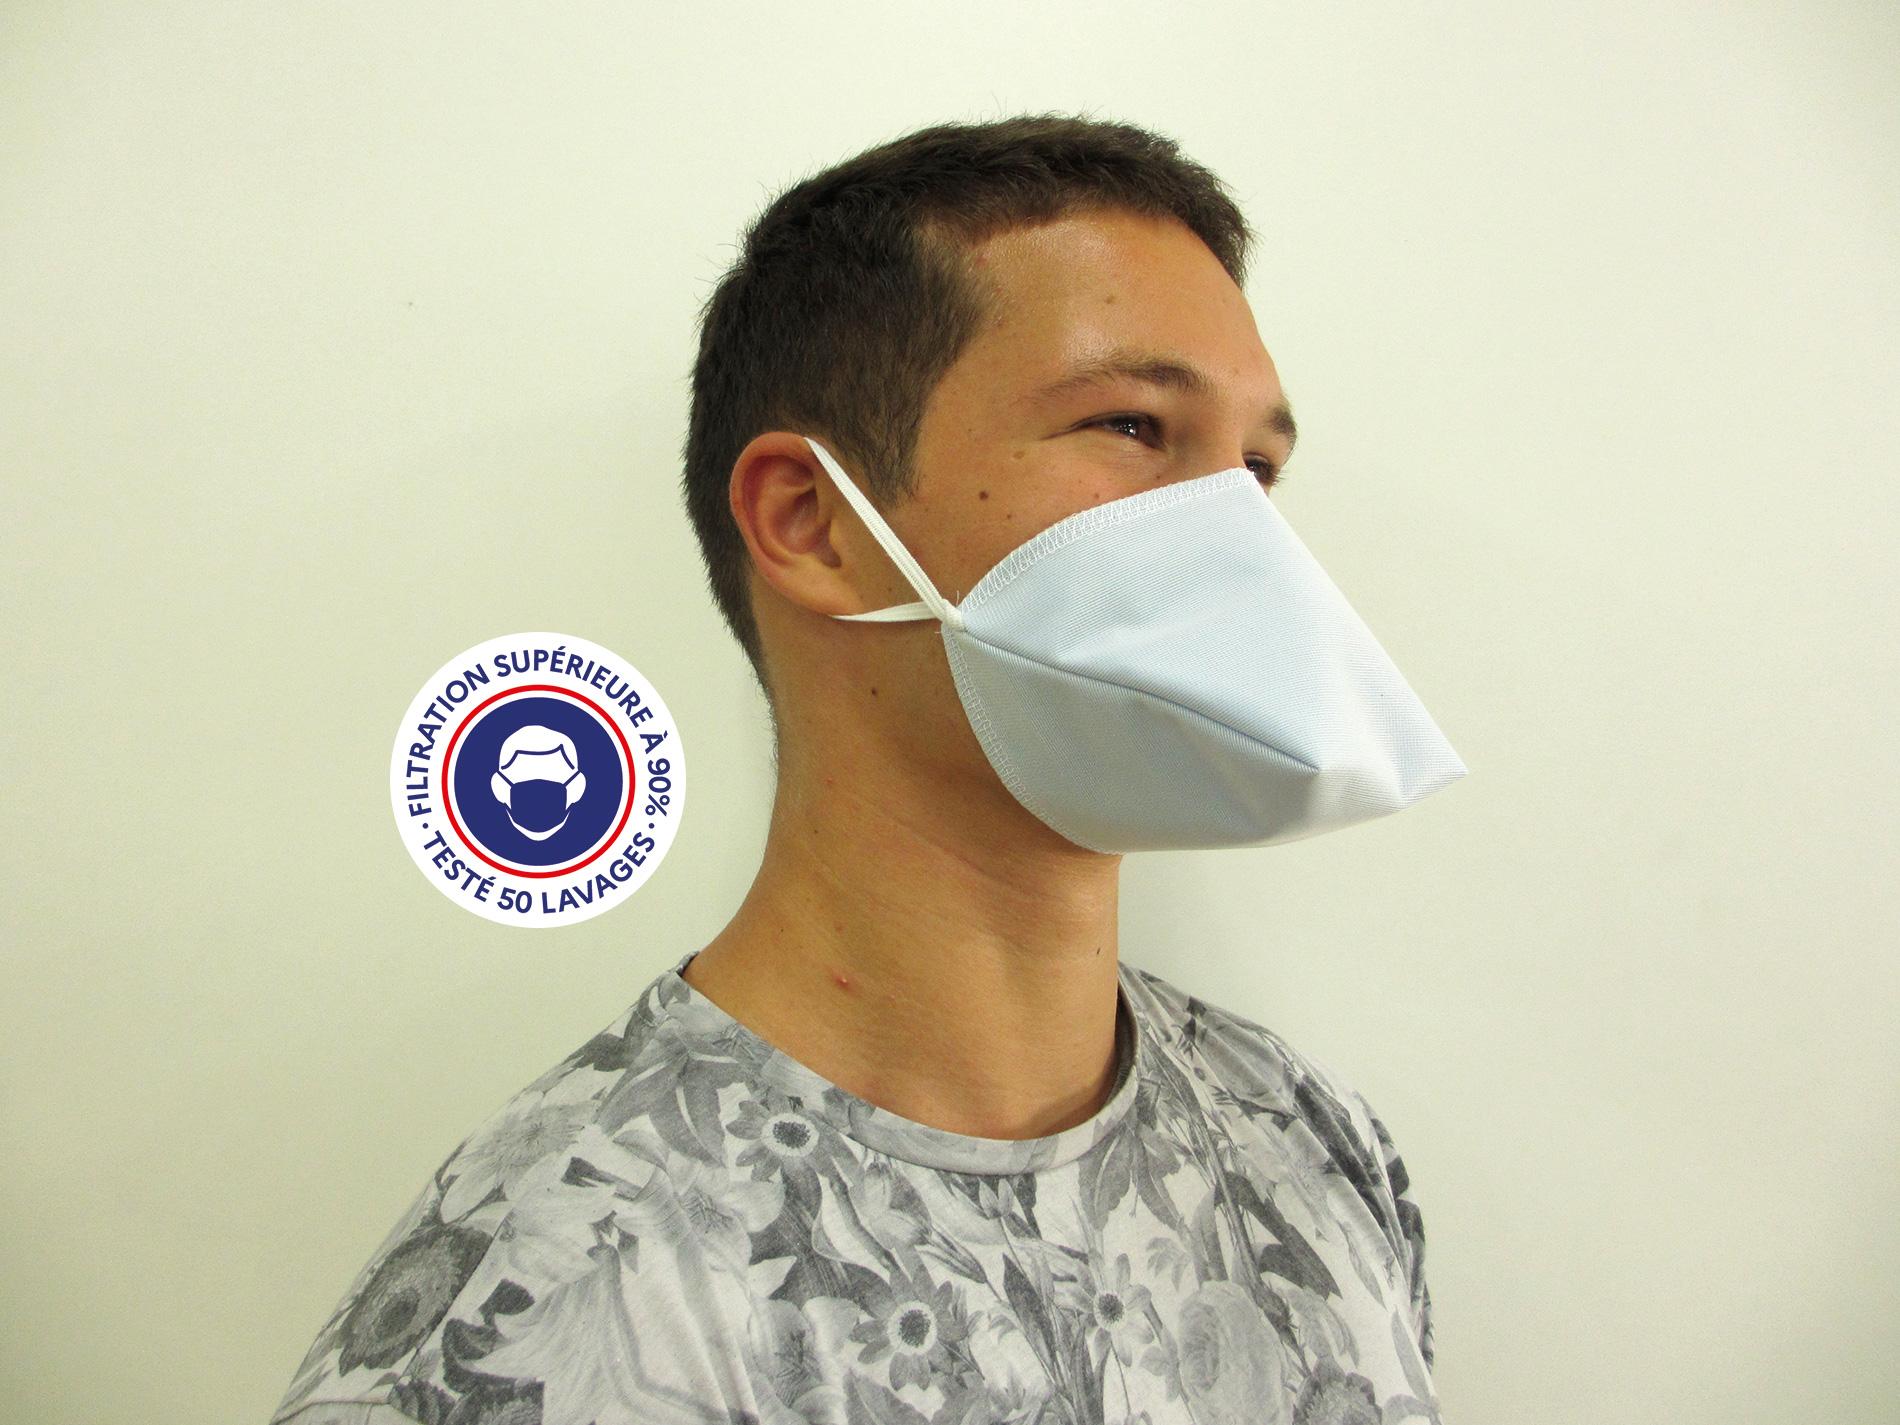 Teximasque 50 lavages - Masque Grand Public Filtration >90%